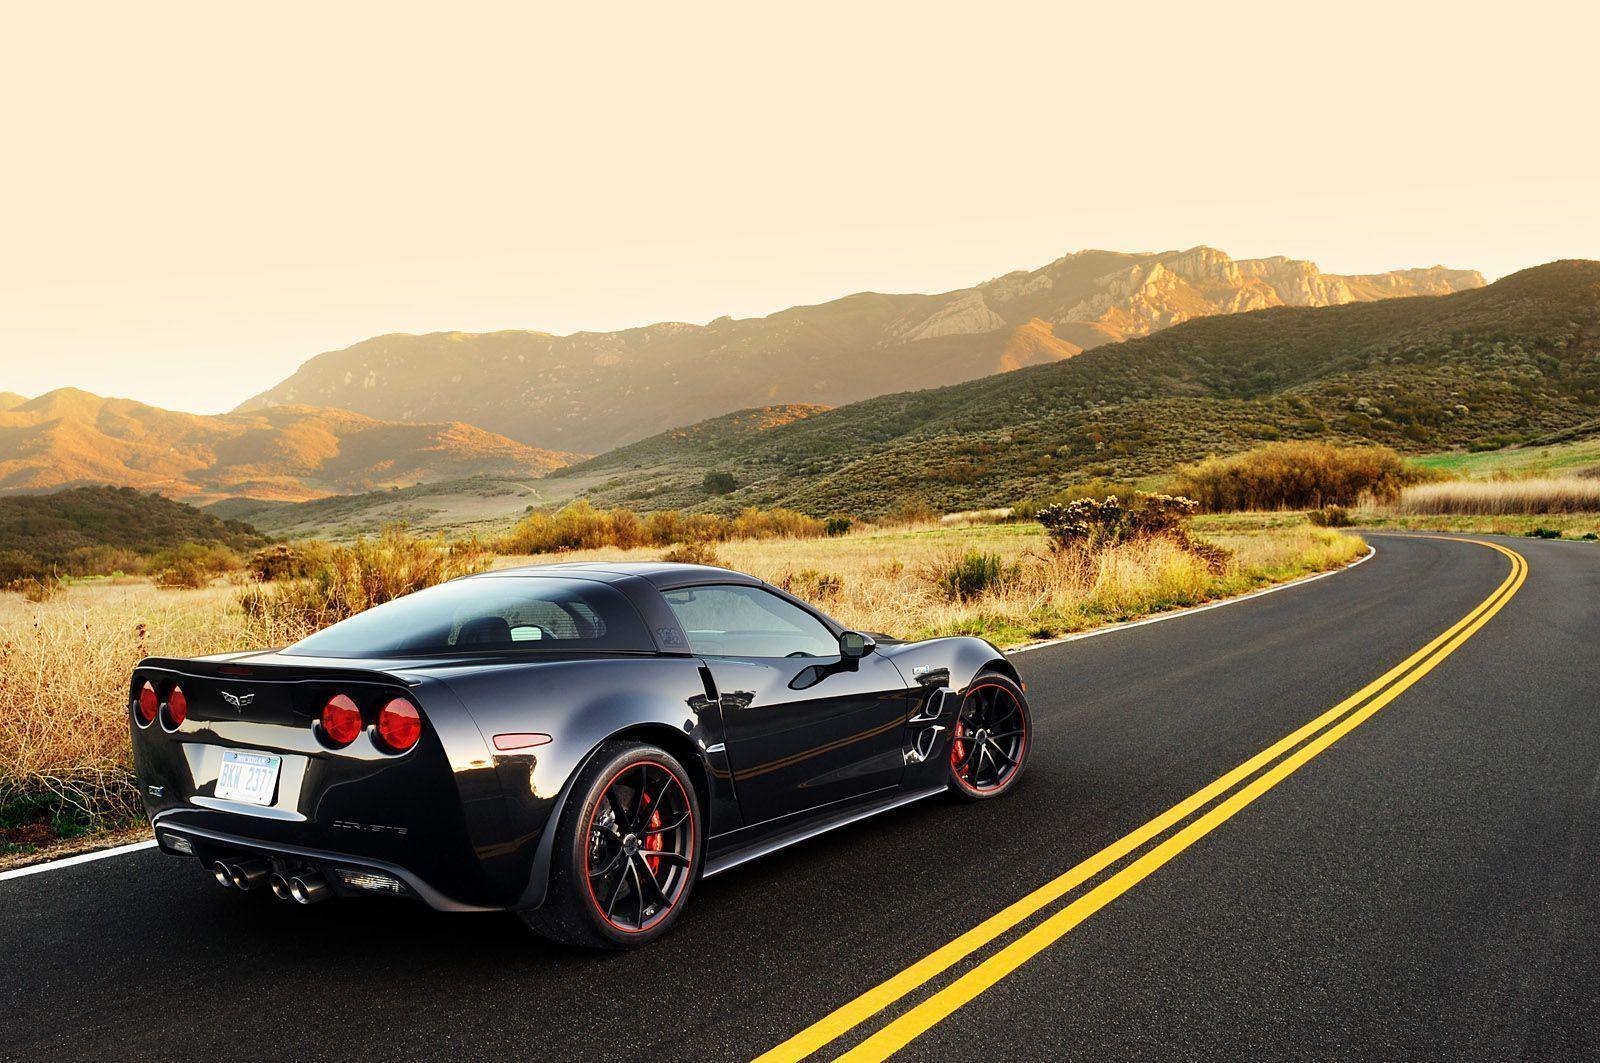 black corvette zr1 wallpapers - photo #23